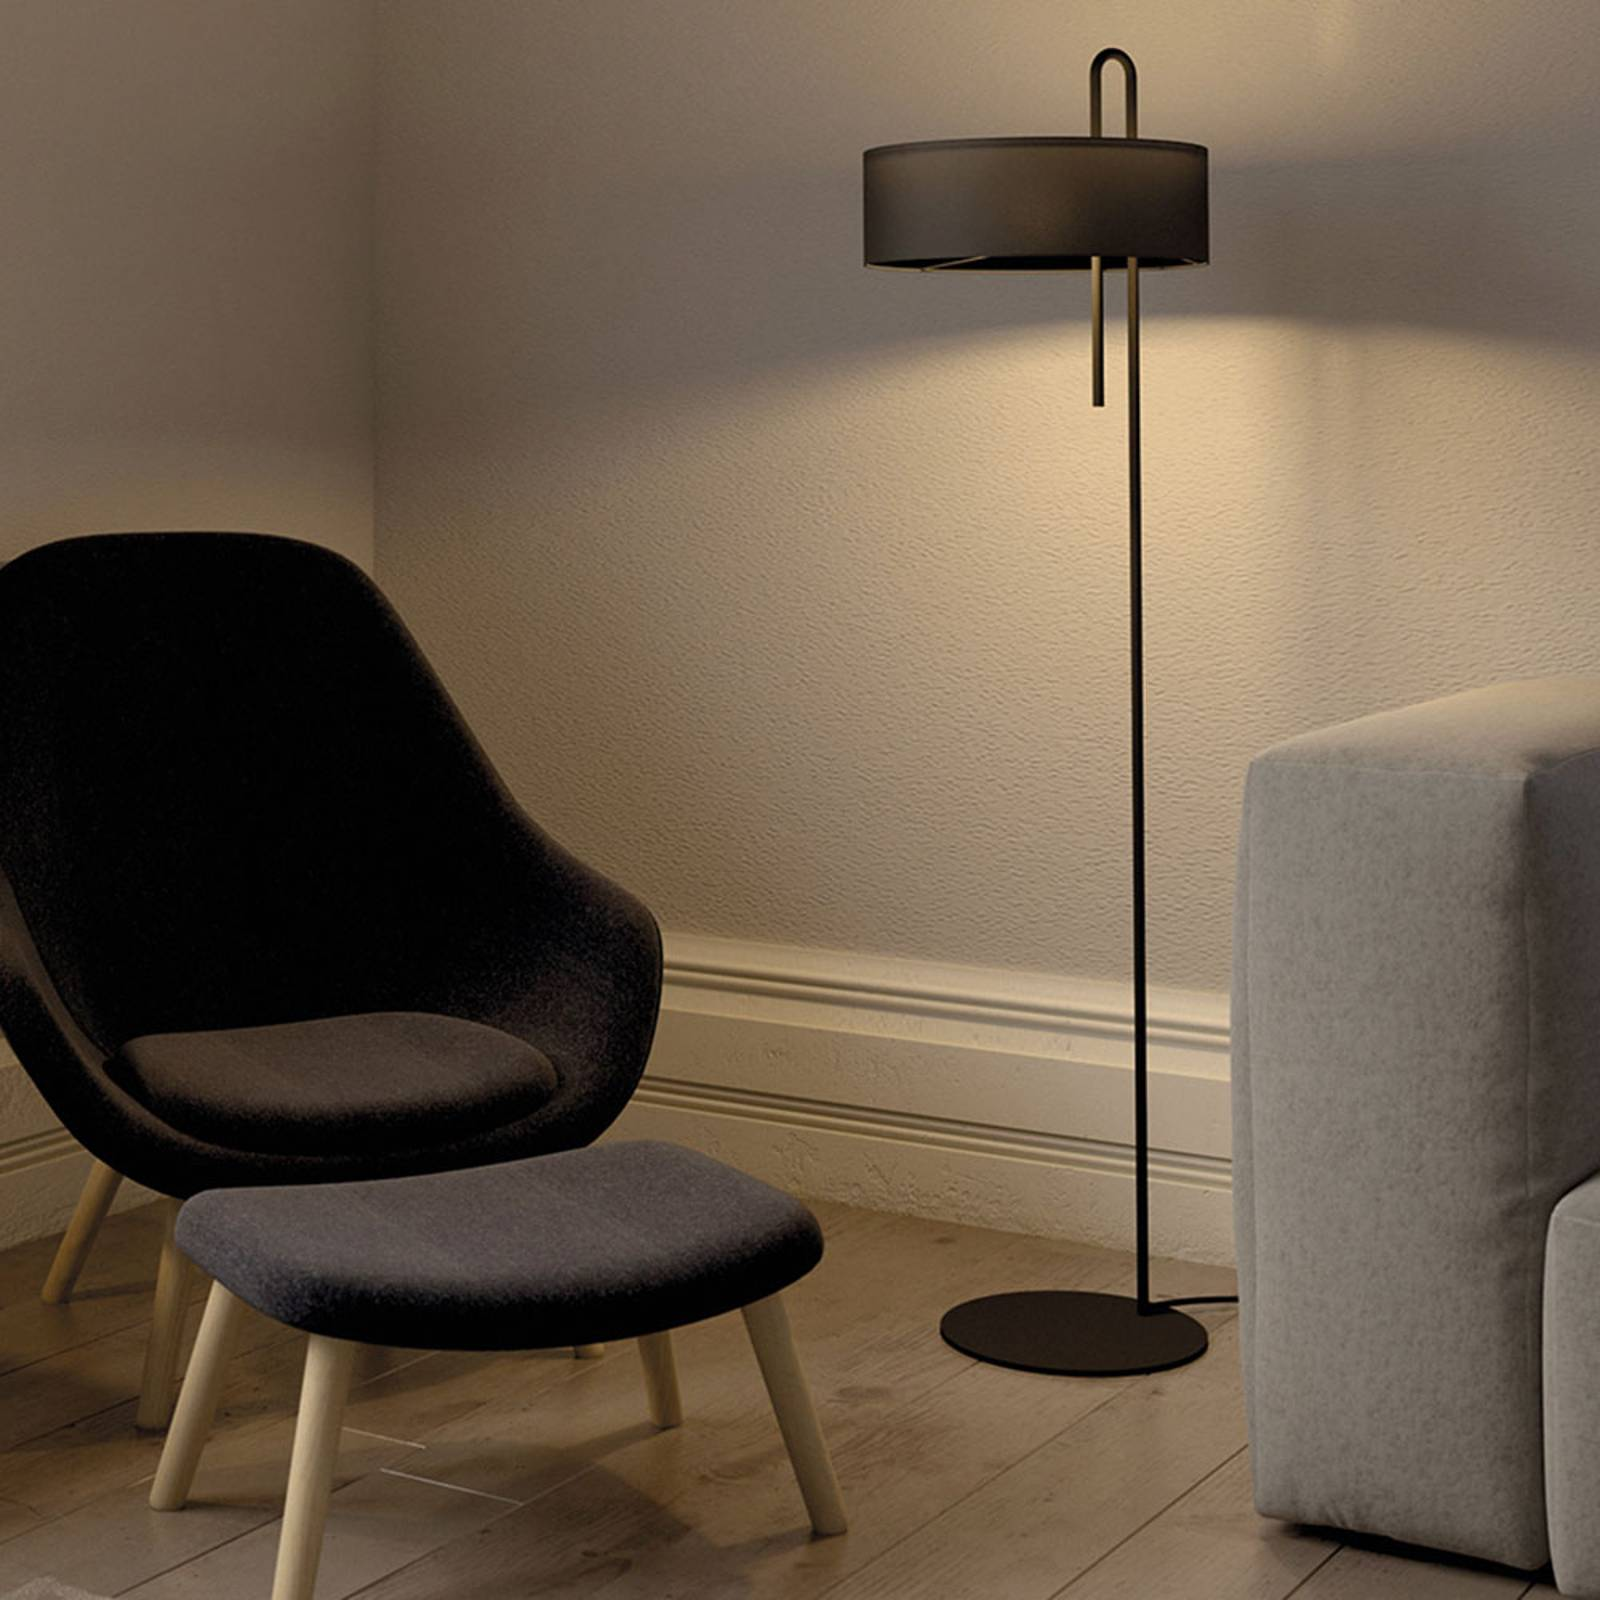 Tekstiili-lattiavalo Clip, musta, korkeus 150 cm